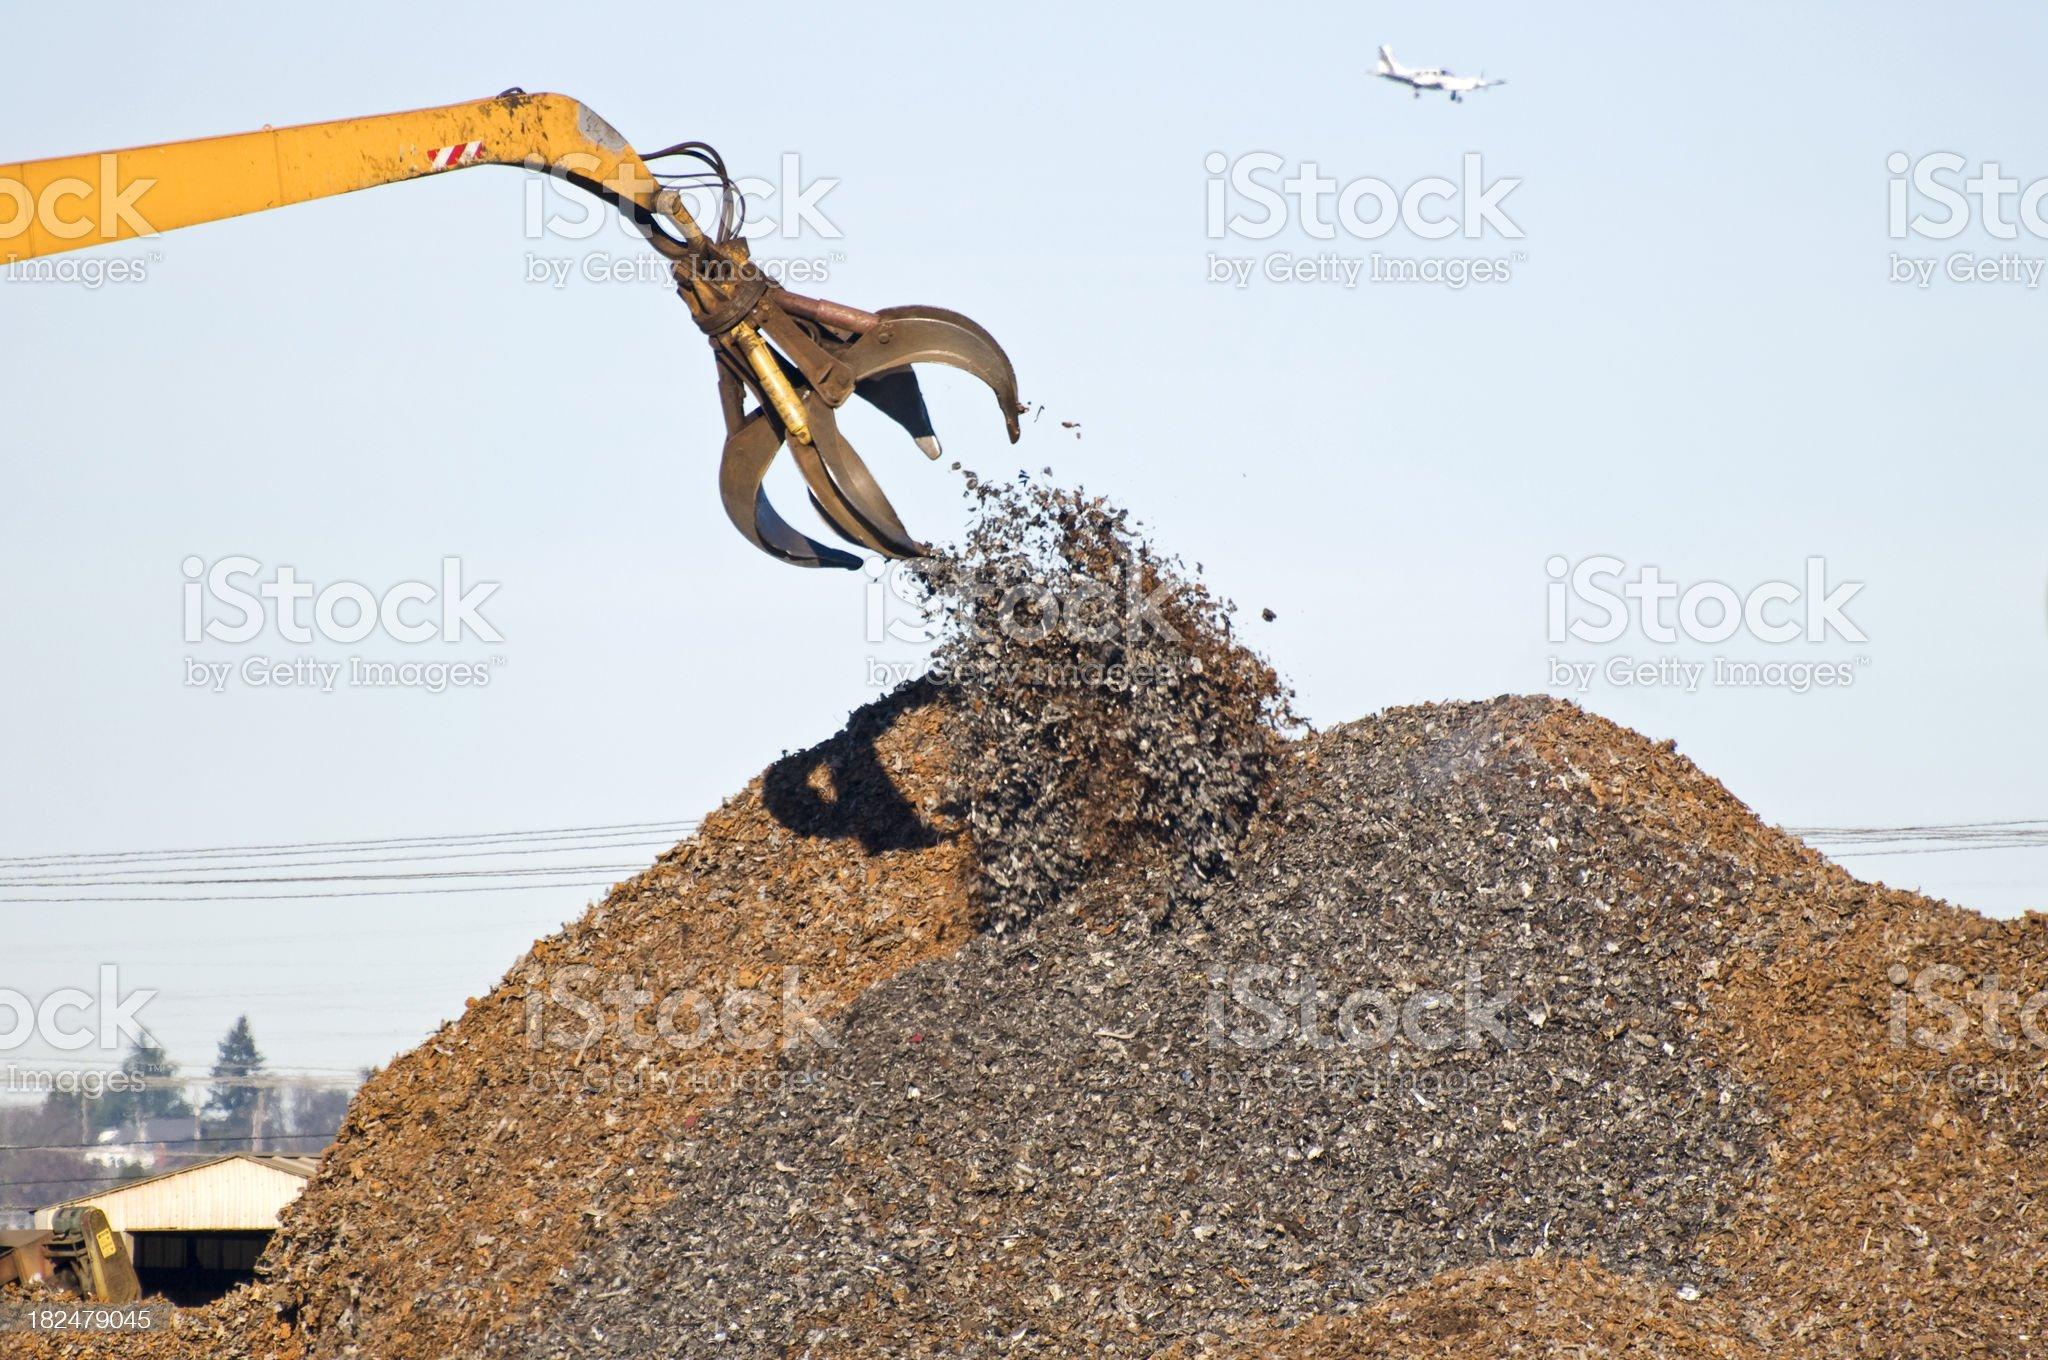 Crane depositing shredded metal on pile royalty-free stock photo